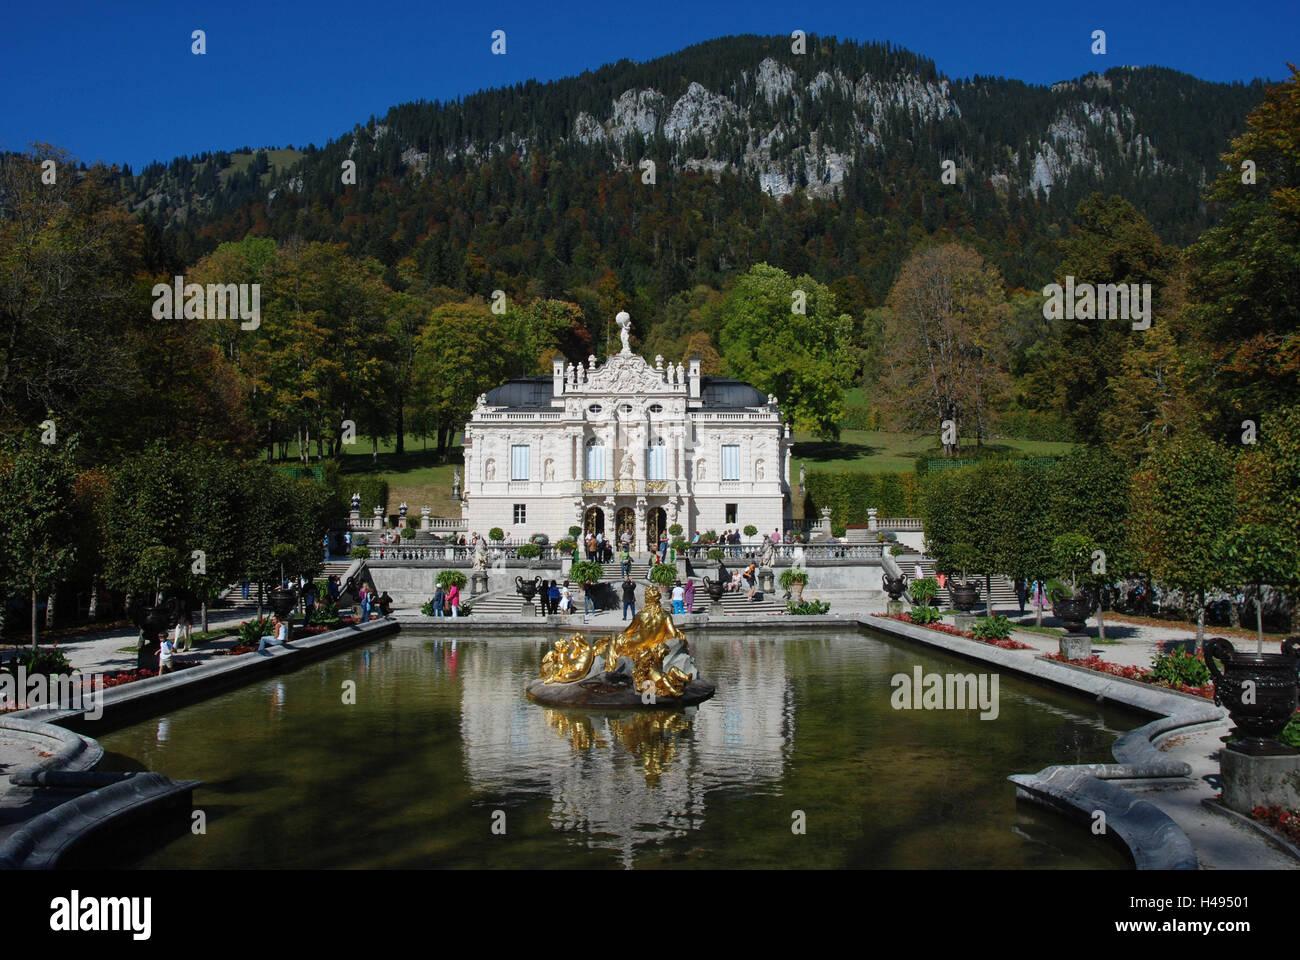 Germany, Bavaria, lock, gentle court, park, well, tourist, autumn, Upper Bavaria, castle building, royal castle, - Stock Image